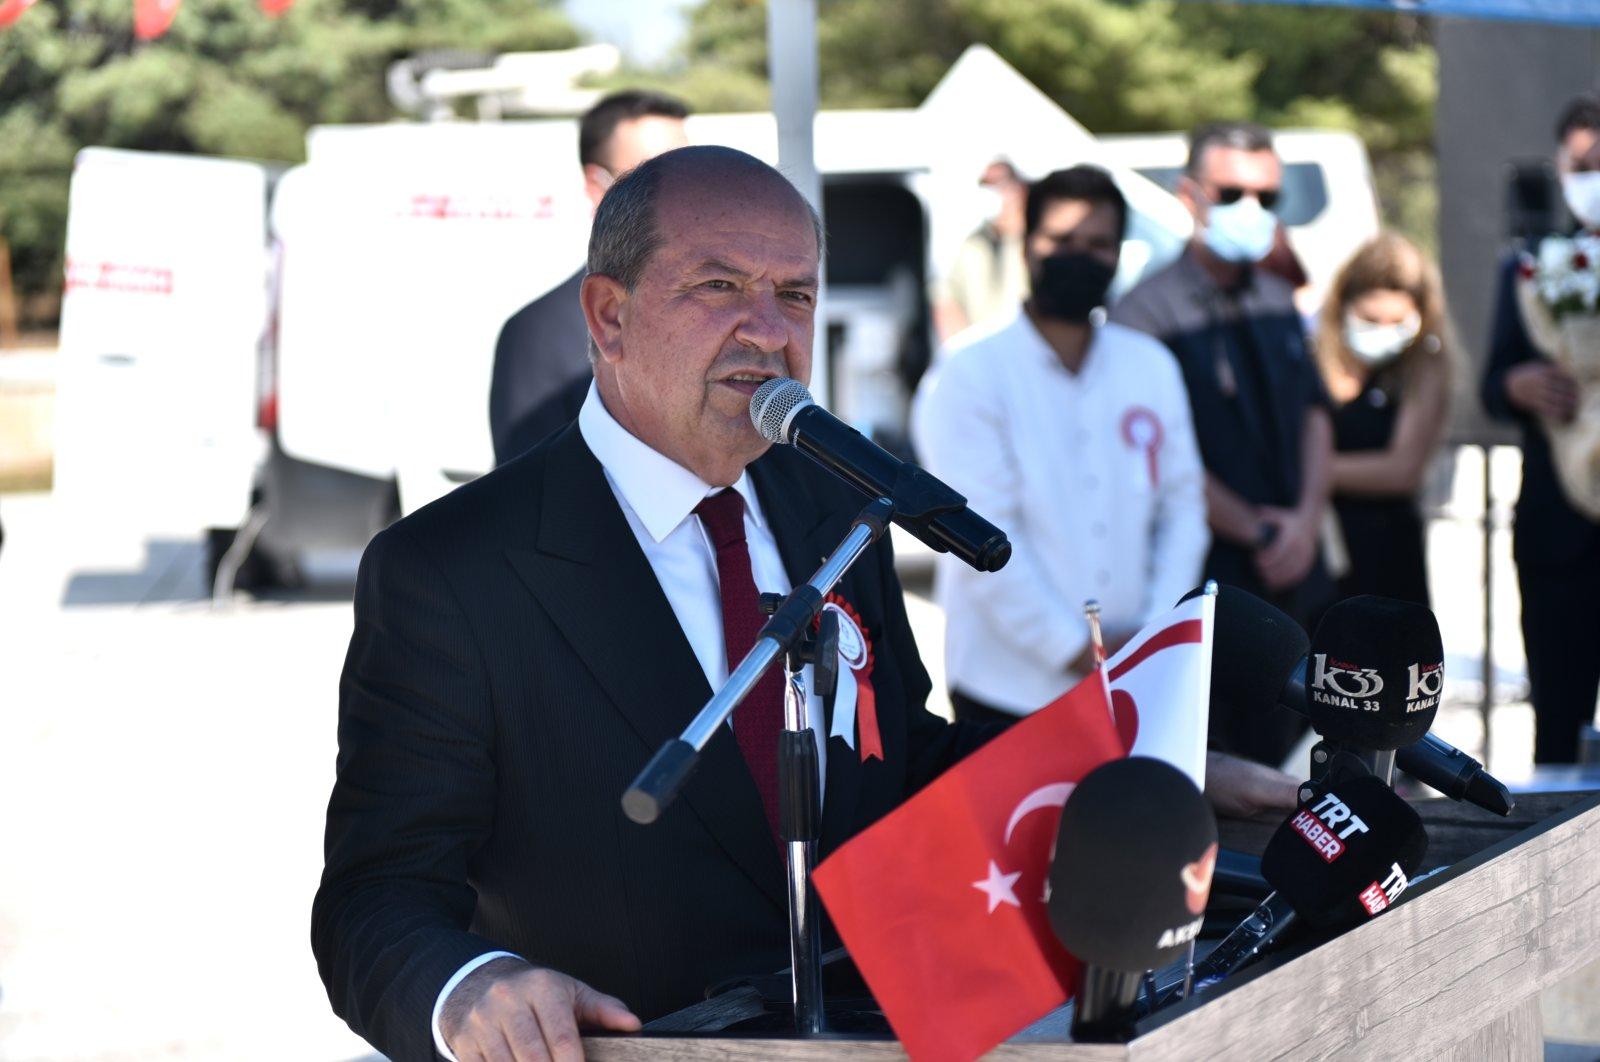 Turkish Republic of Northern Cyprus President Ersin Tatar speaks at a commemoration ceremony in Turkey's Mersin, July 14, 2021. (AA Photo)